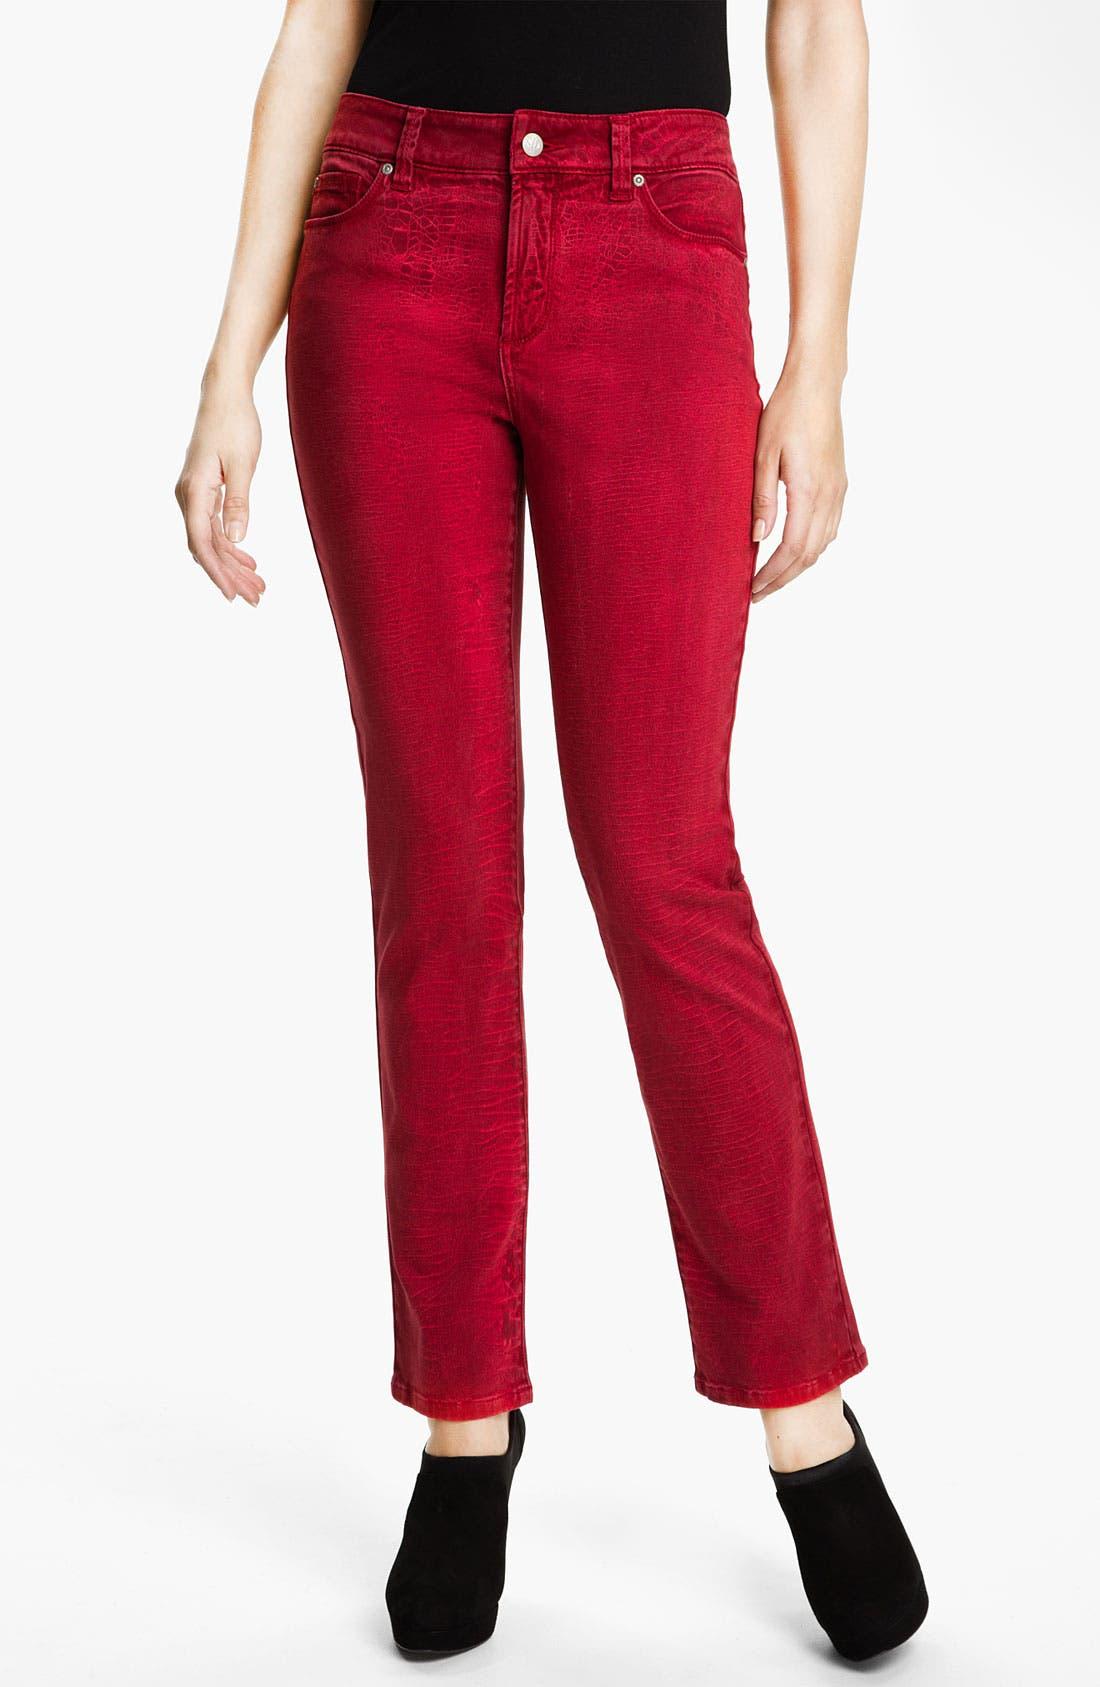 Main Image - NYDJ 'Sheri - Shattered' Print Skinny Twill Jeans (Petite)